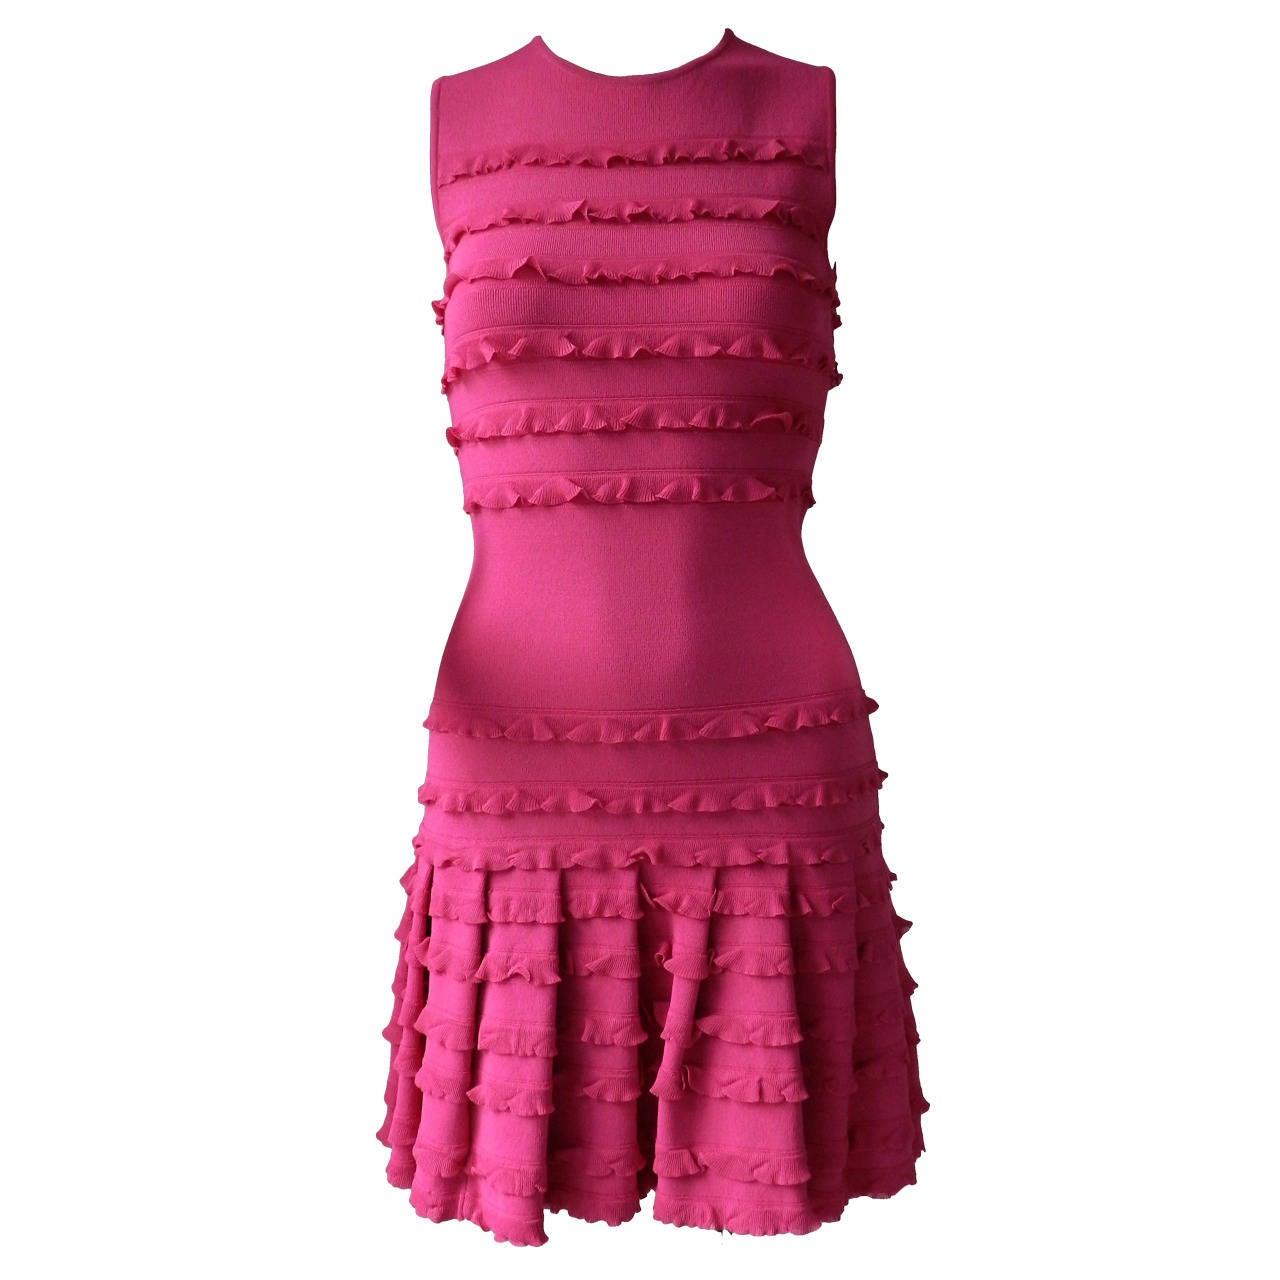 Christian Dior Galliano Hot Fuchsia Jersey Dress 1